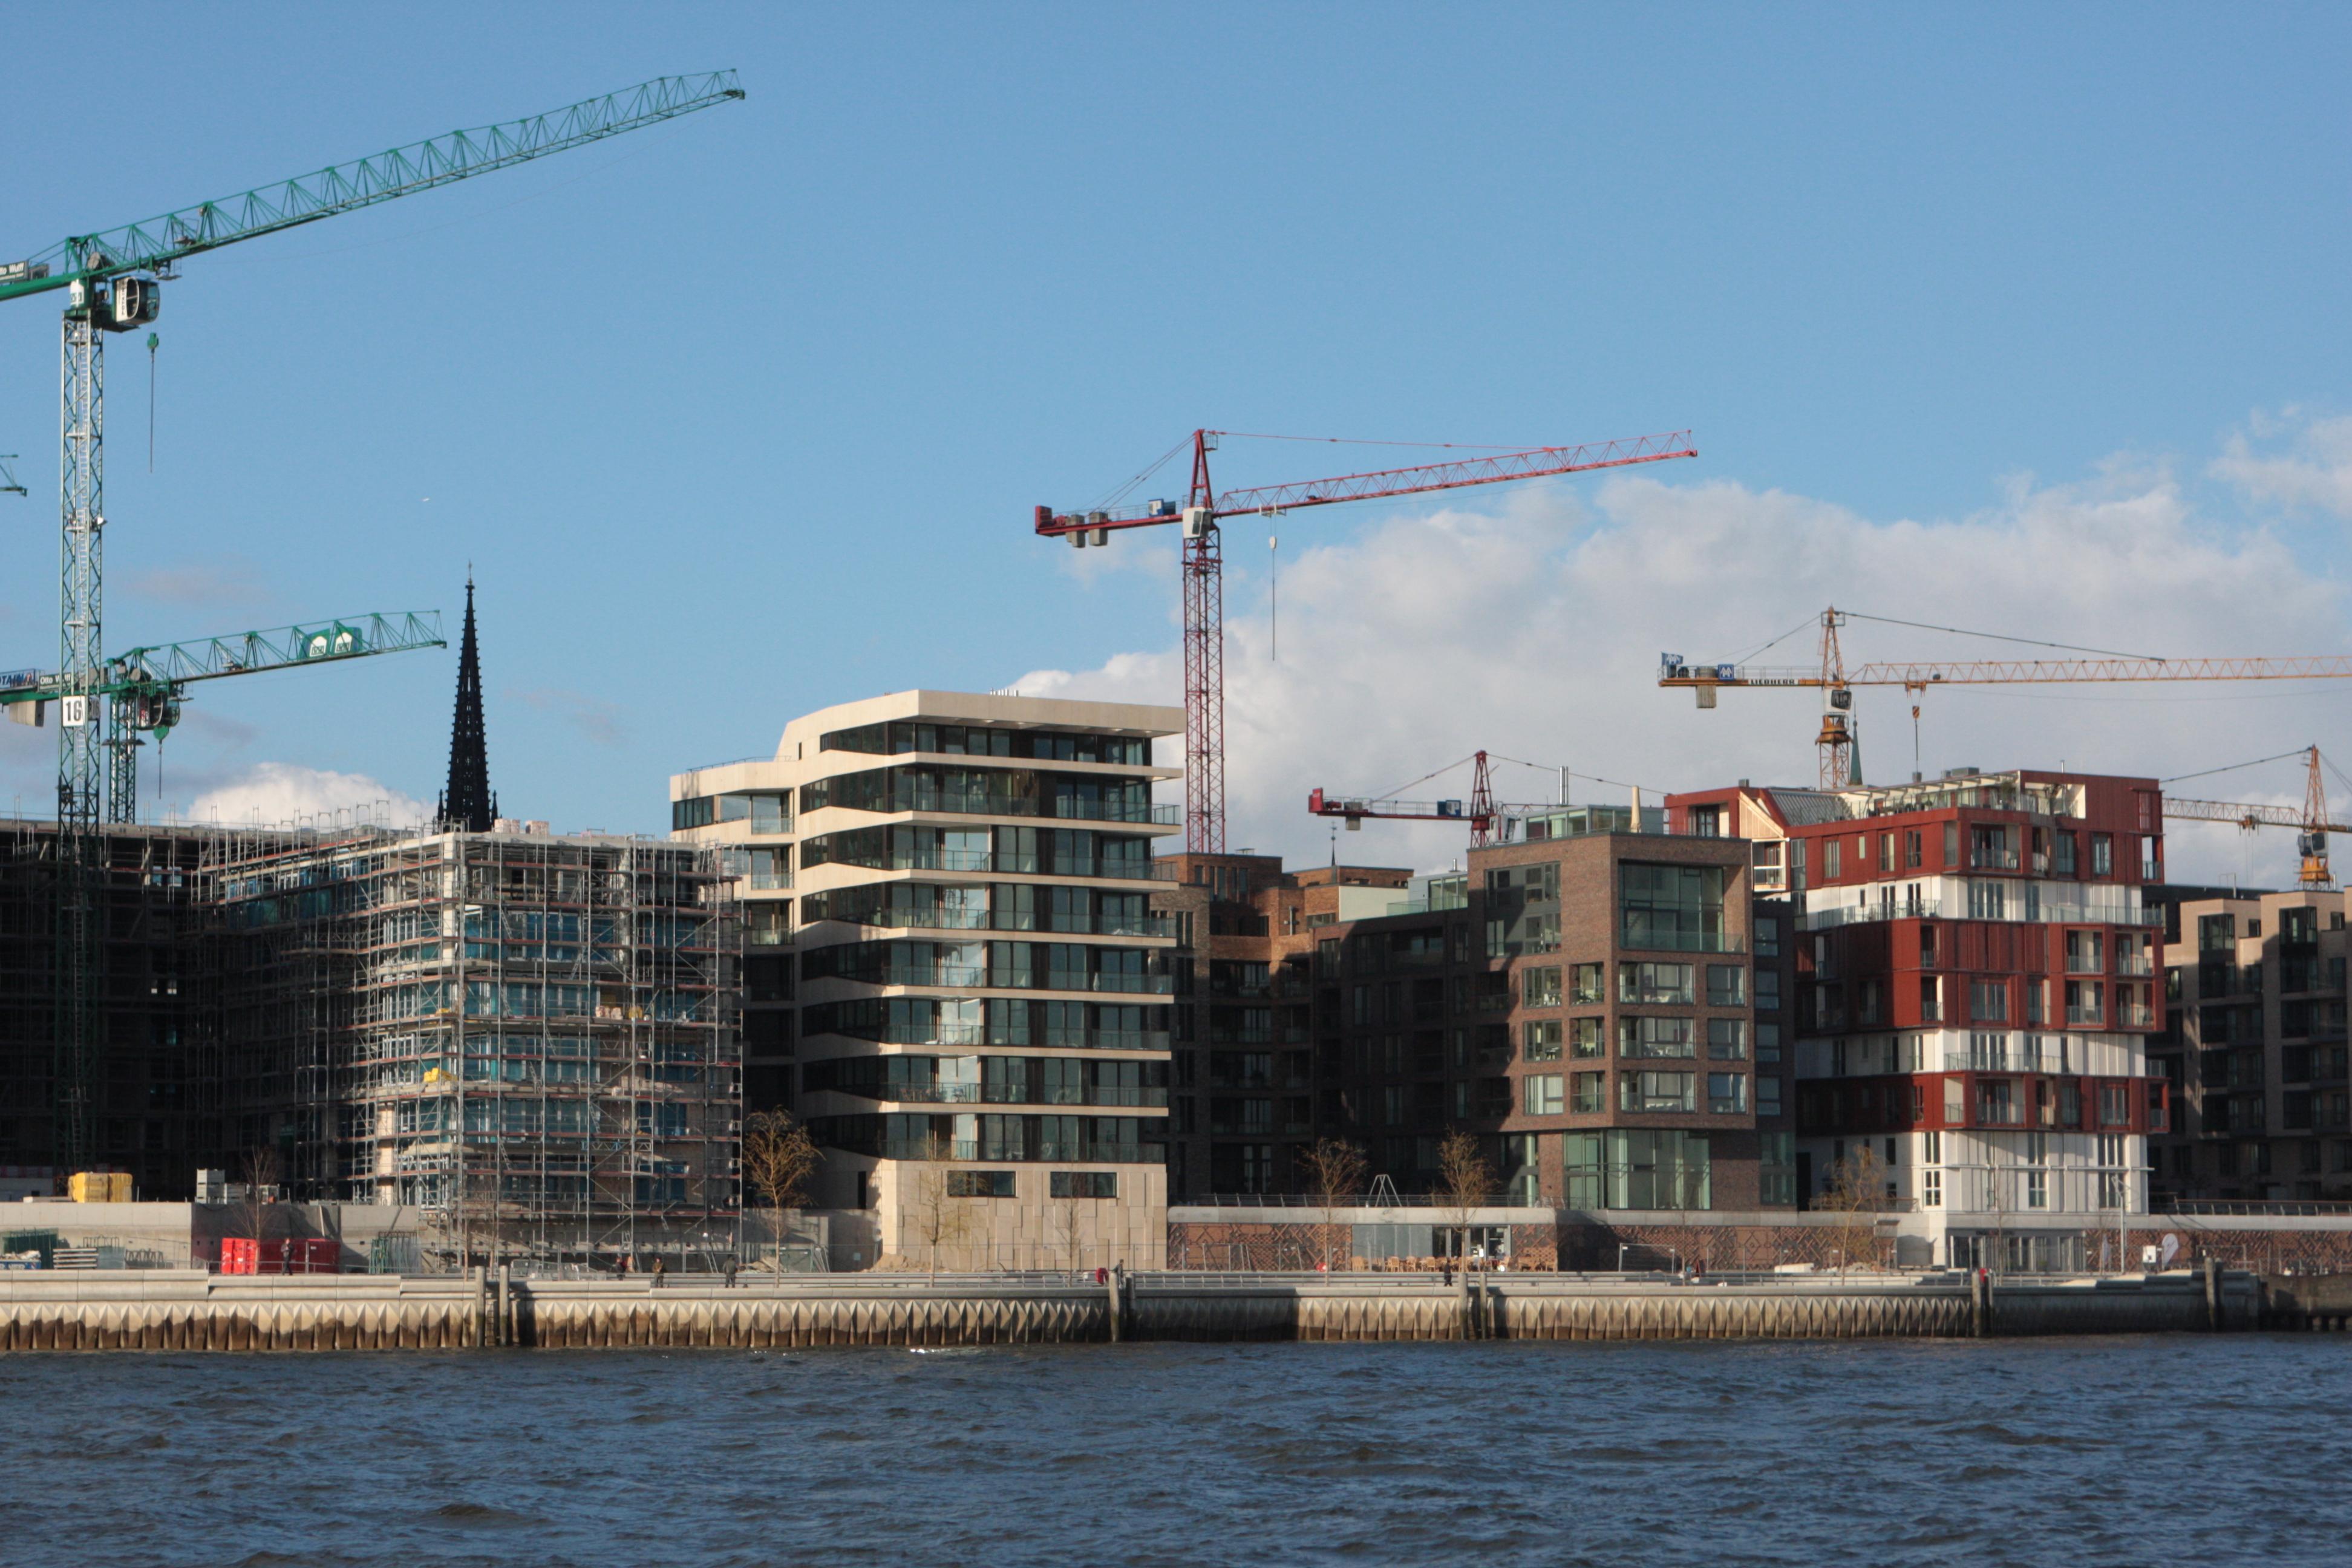 http://upload.wikimedia.org/wikipedia/commons/4/4e/Hamburg_Hafencity_Baustelle_2008-03-18.JPG